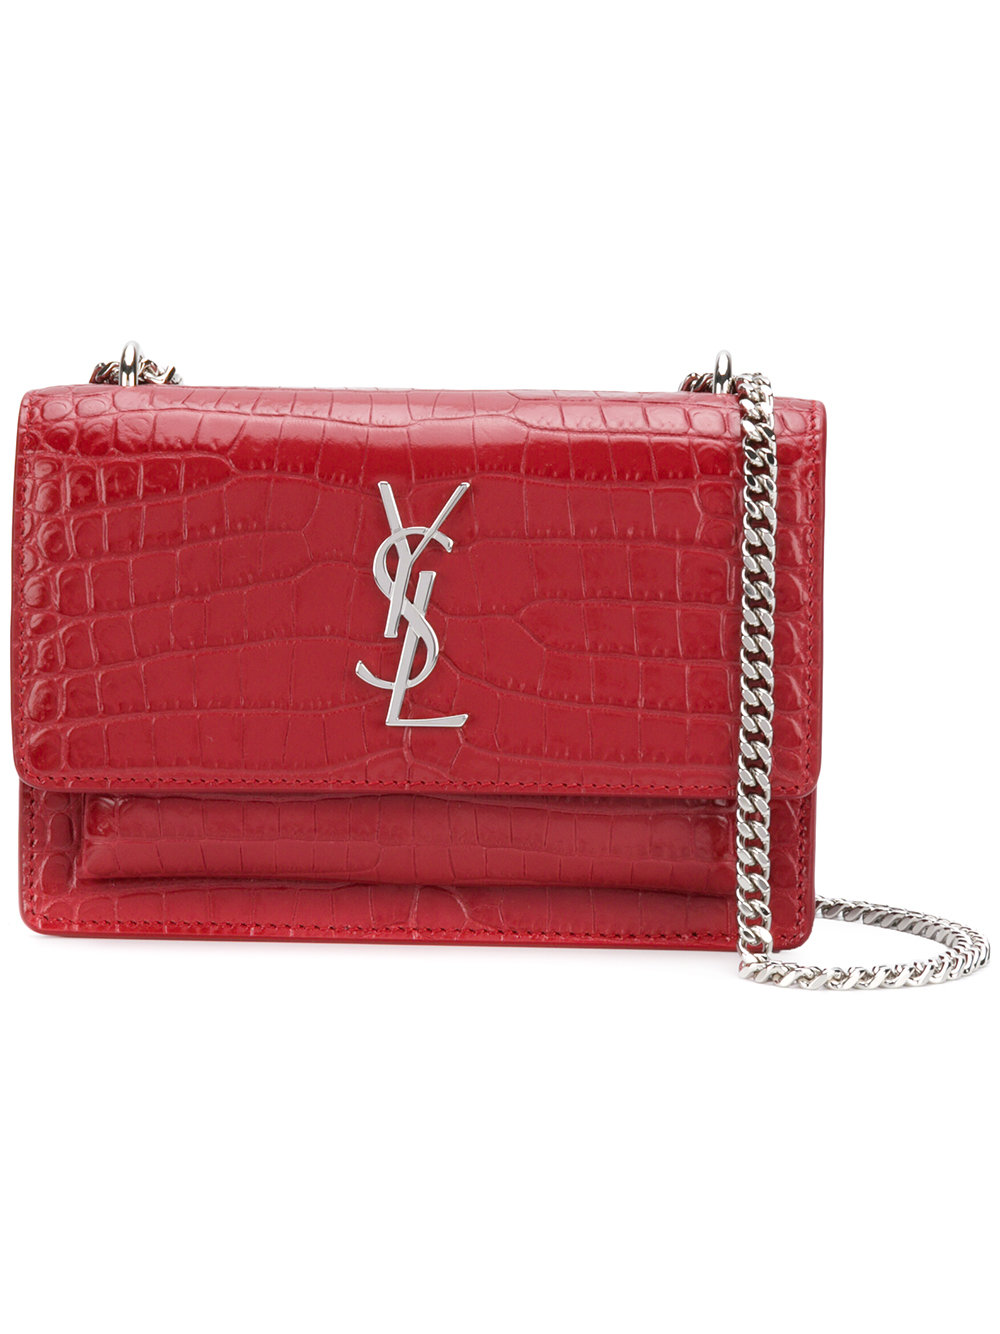 SAINT LAURENT shoulder bag - $1,650